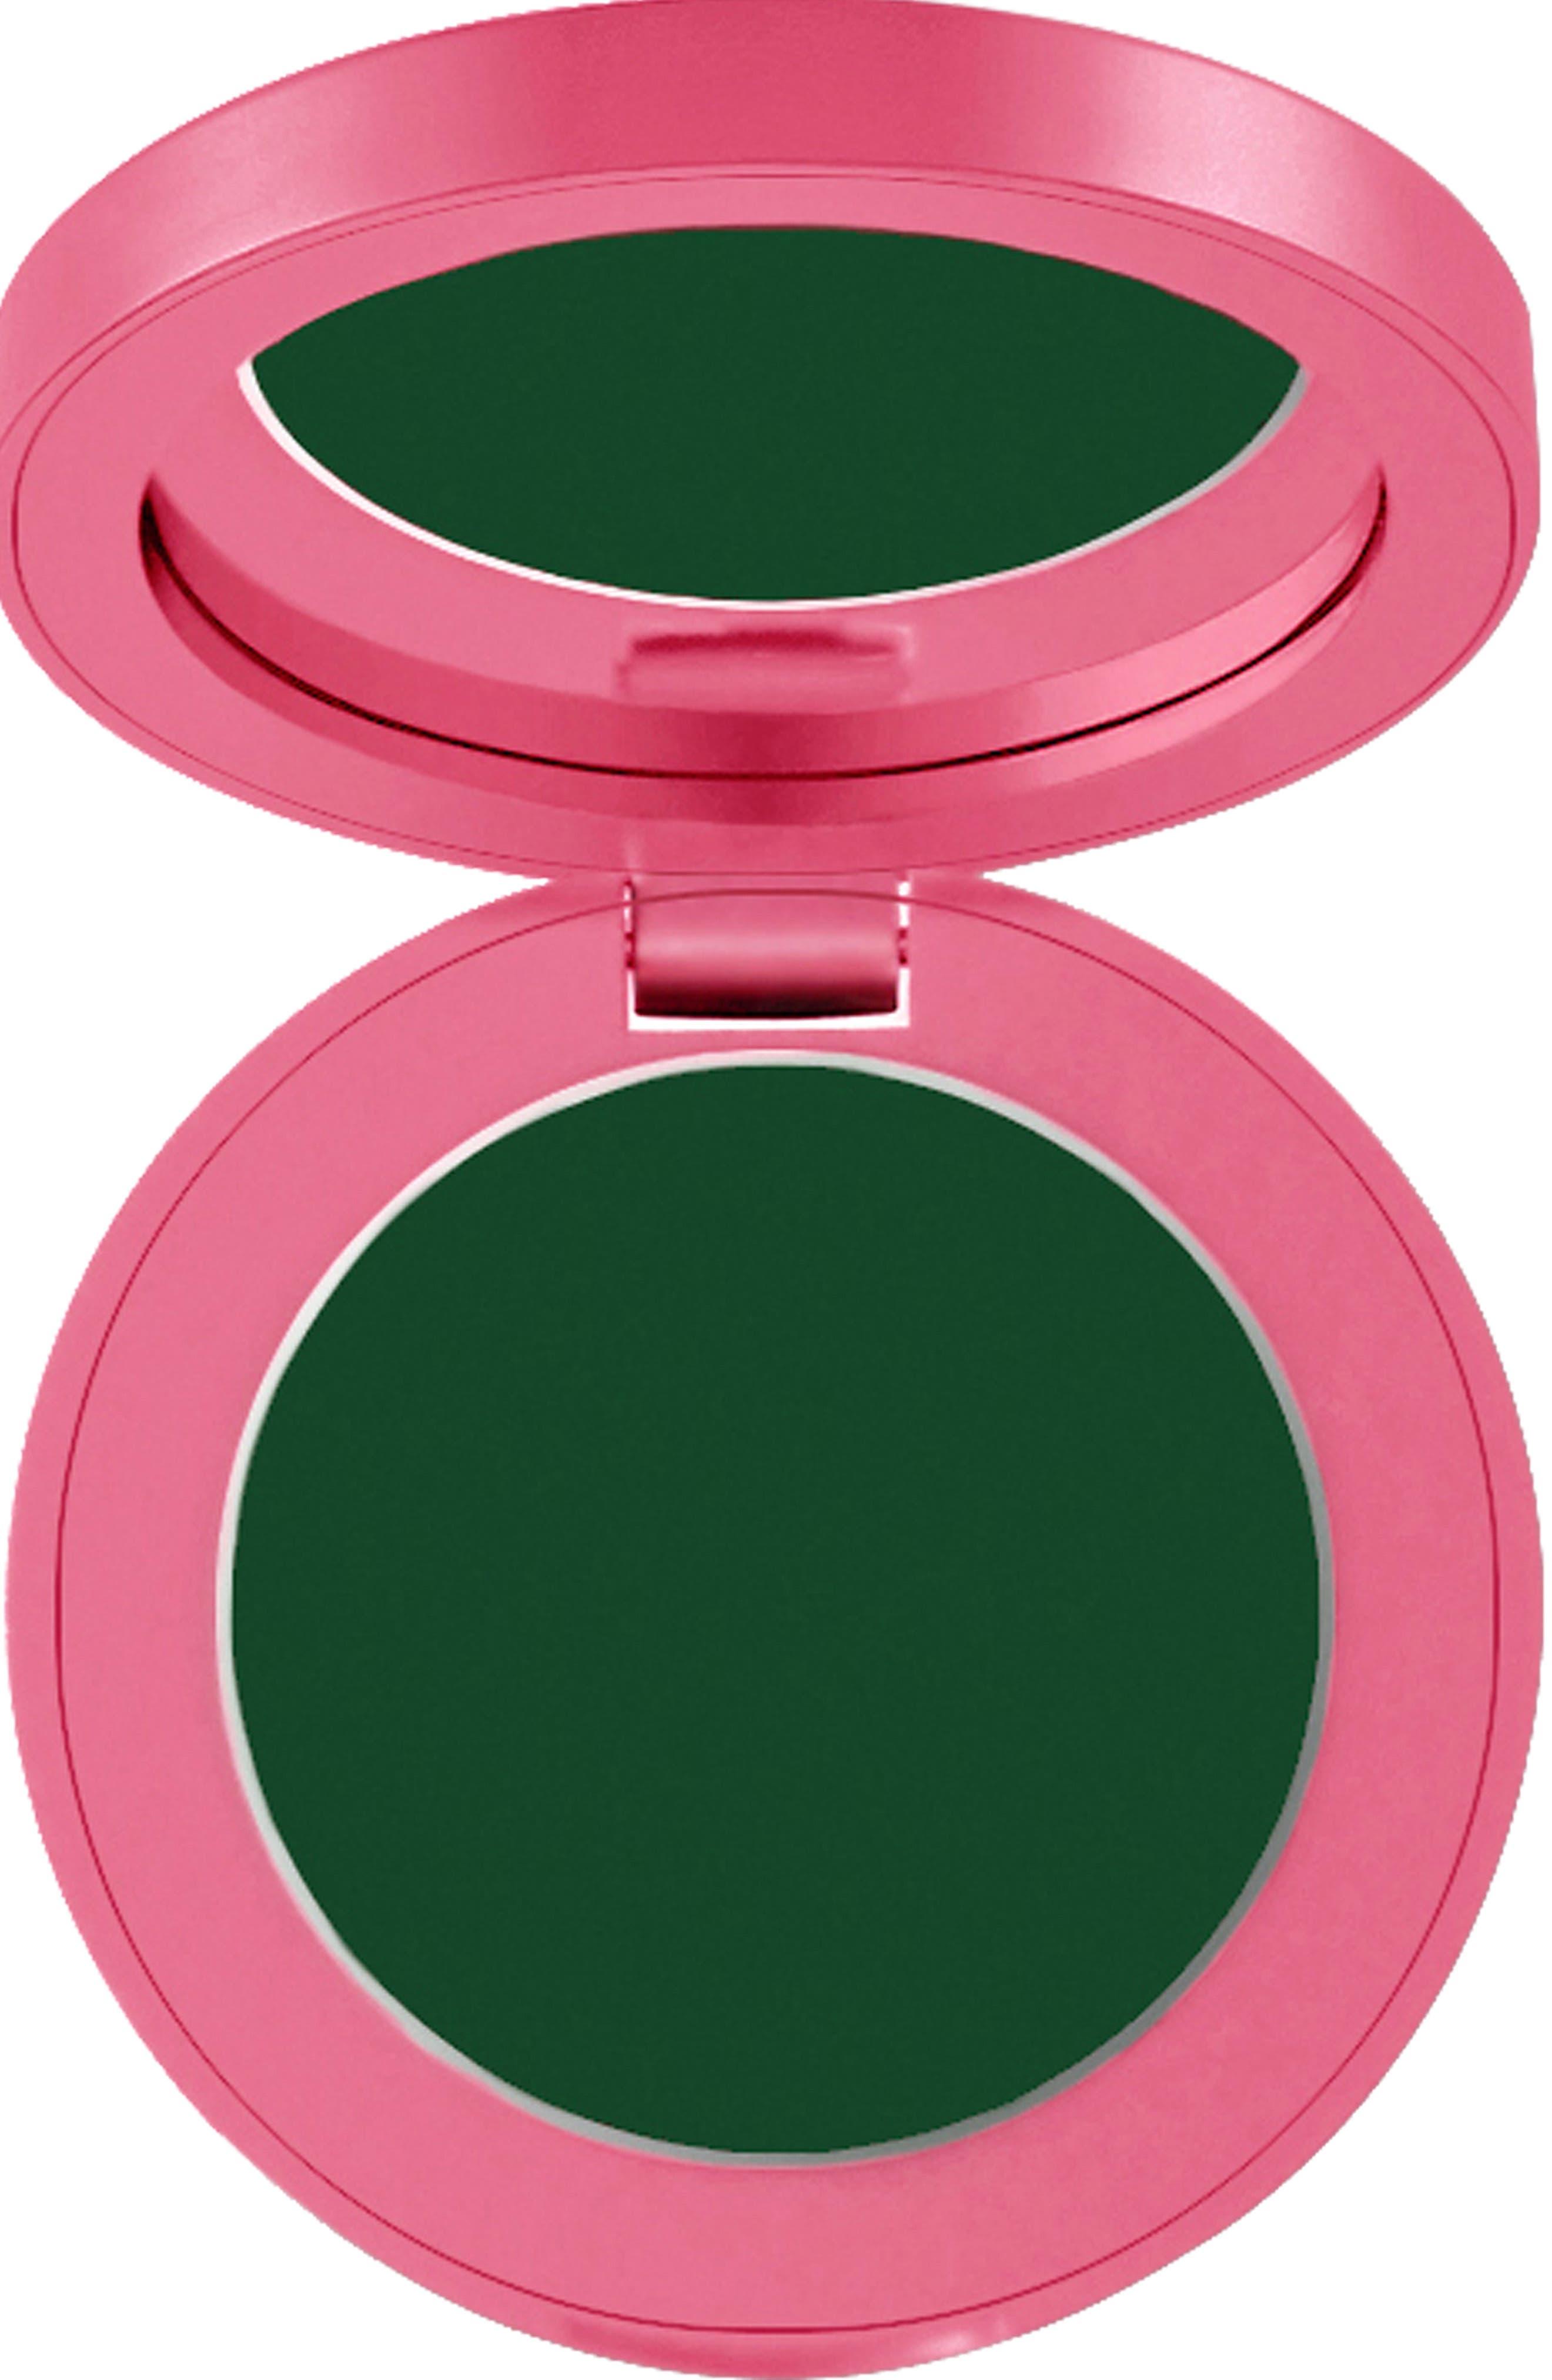 SPACE.NK.apothecary Lipstick Queen Frog Prince Cream Blush,                             Alternate thumbnail 3, color,